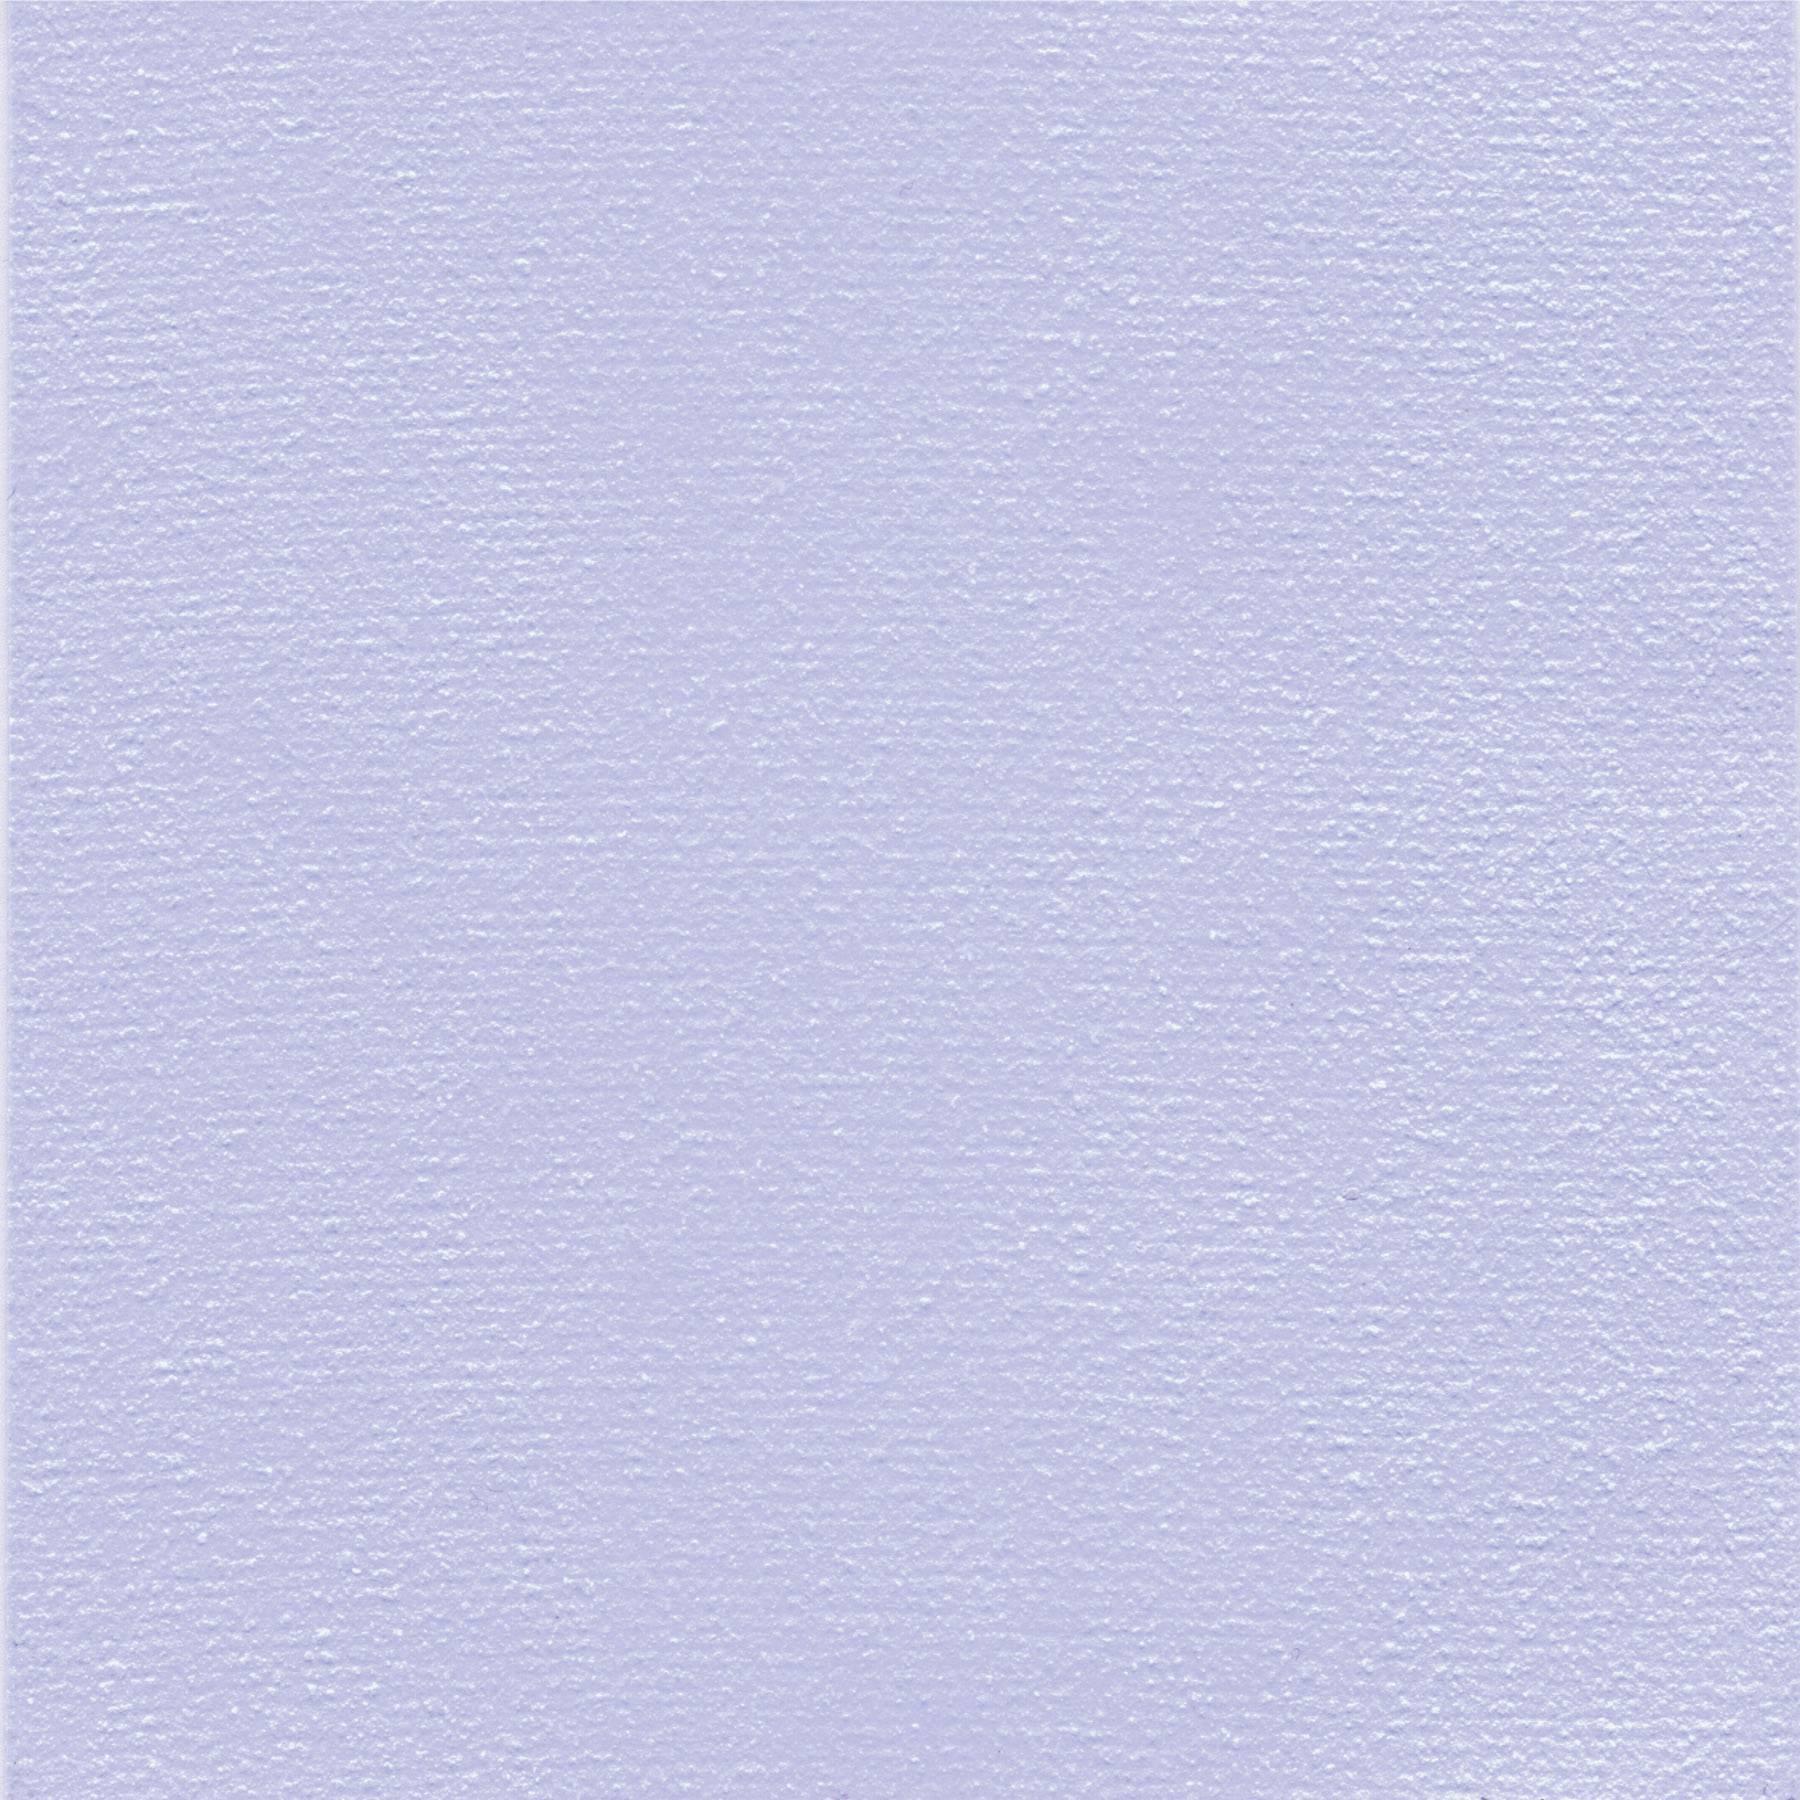 Teplovodivá fólia Kerafol SOFTTHERM 86/300, 0.5 mm, 3 W/mK, (d x š) 100 mm x 100 mm